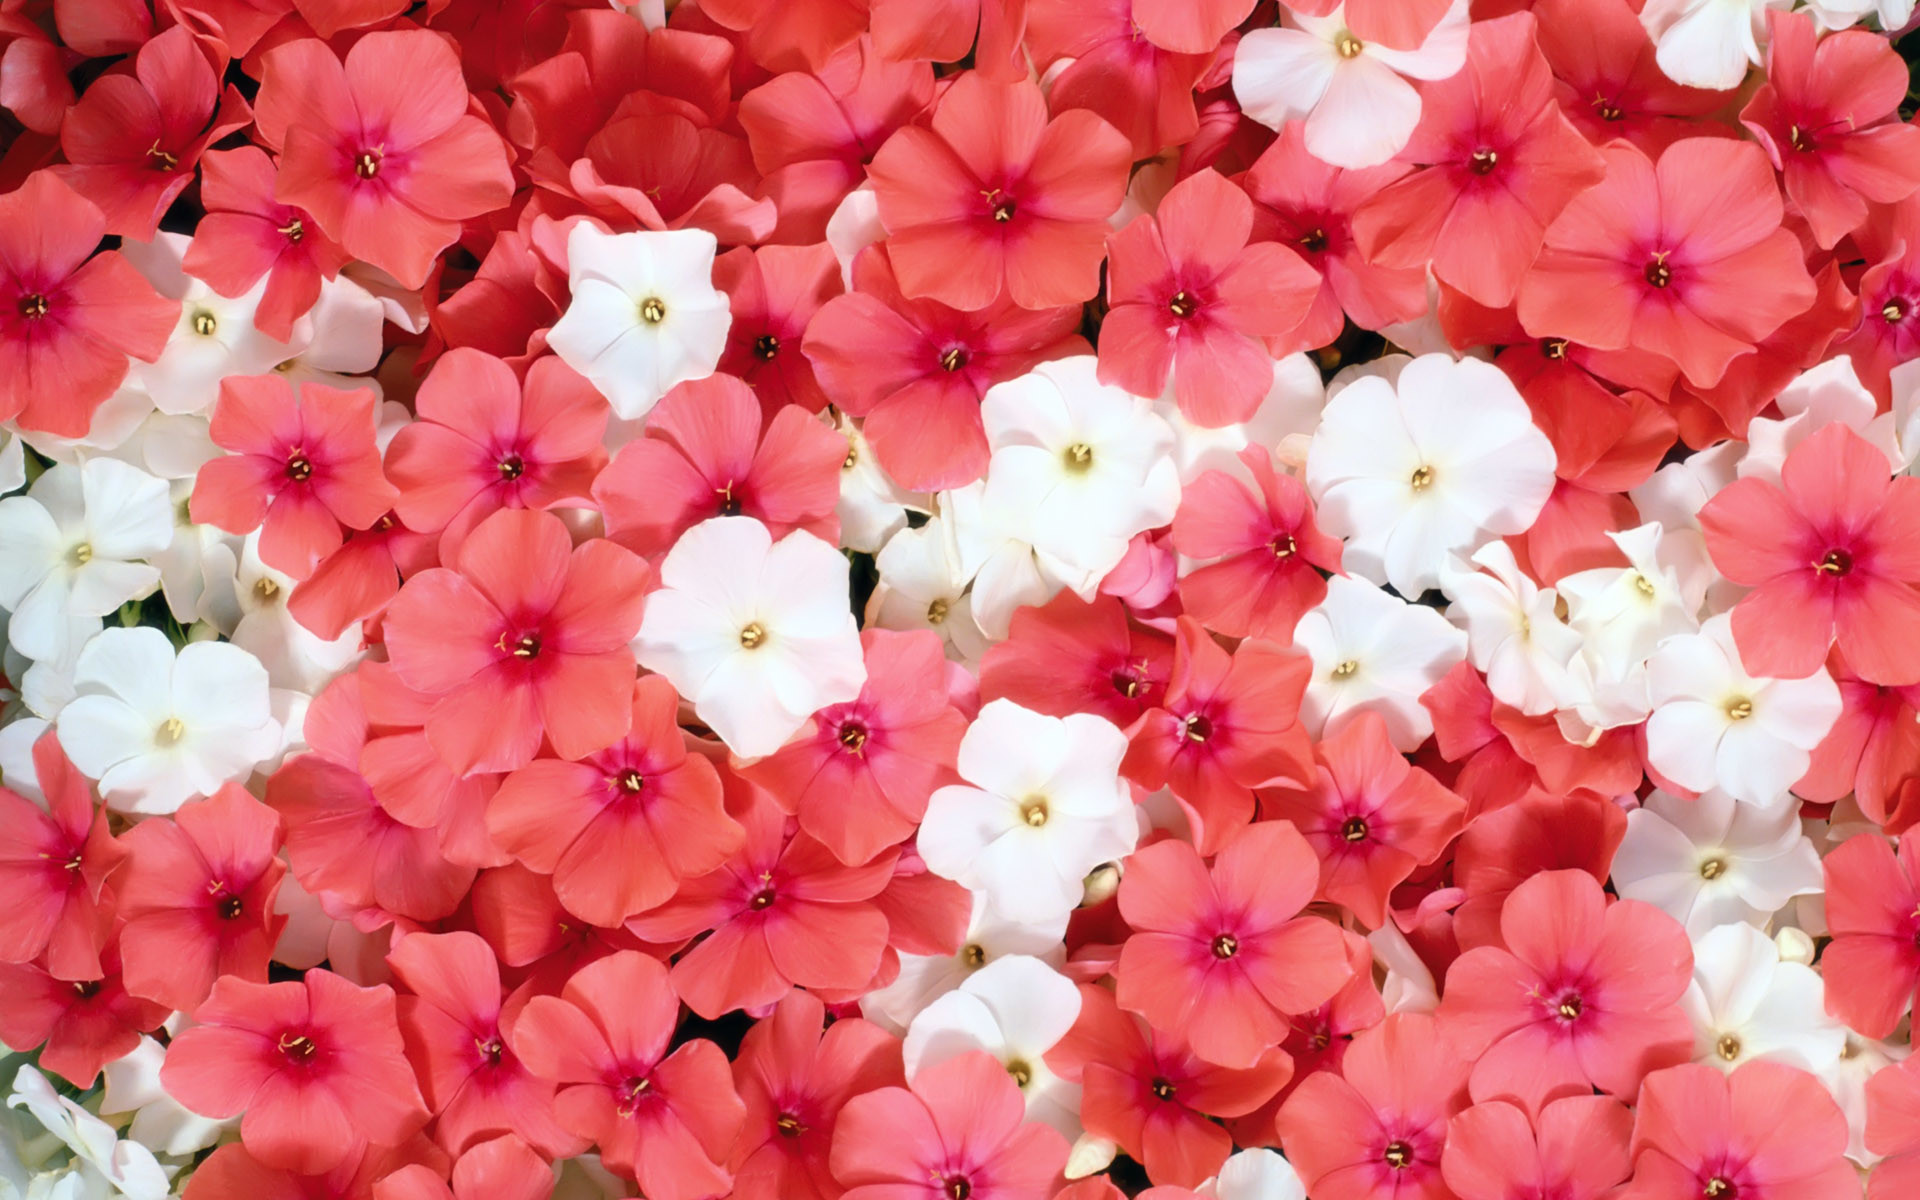 Pink Flower Wallpaper Background 55 Images